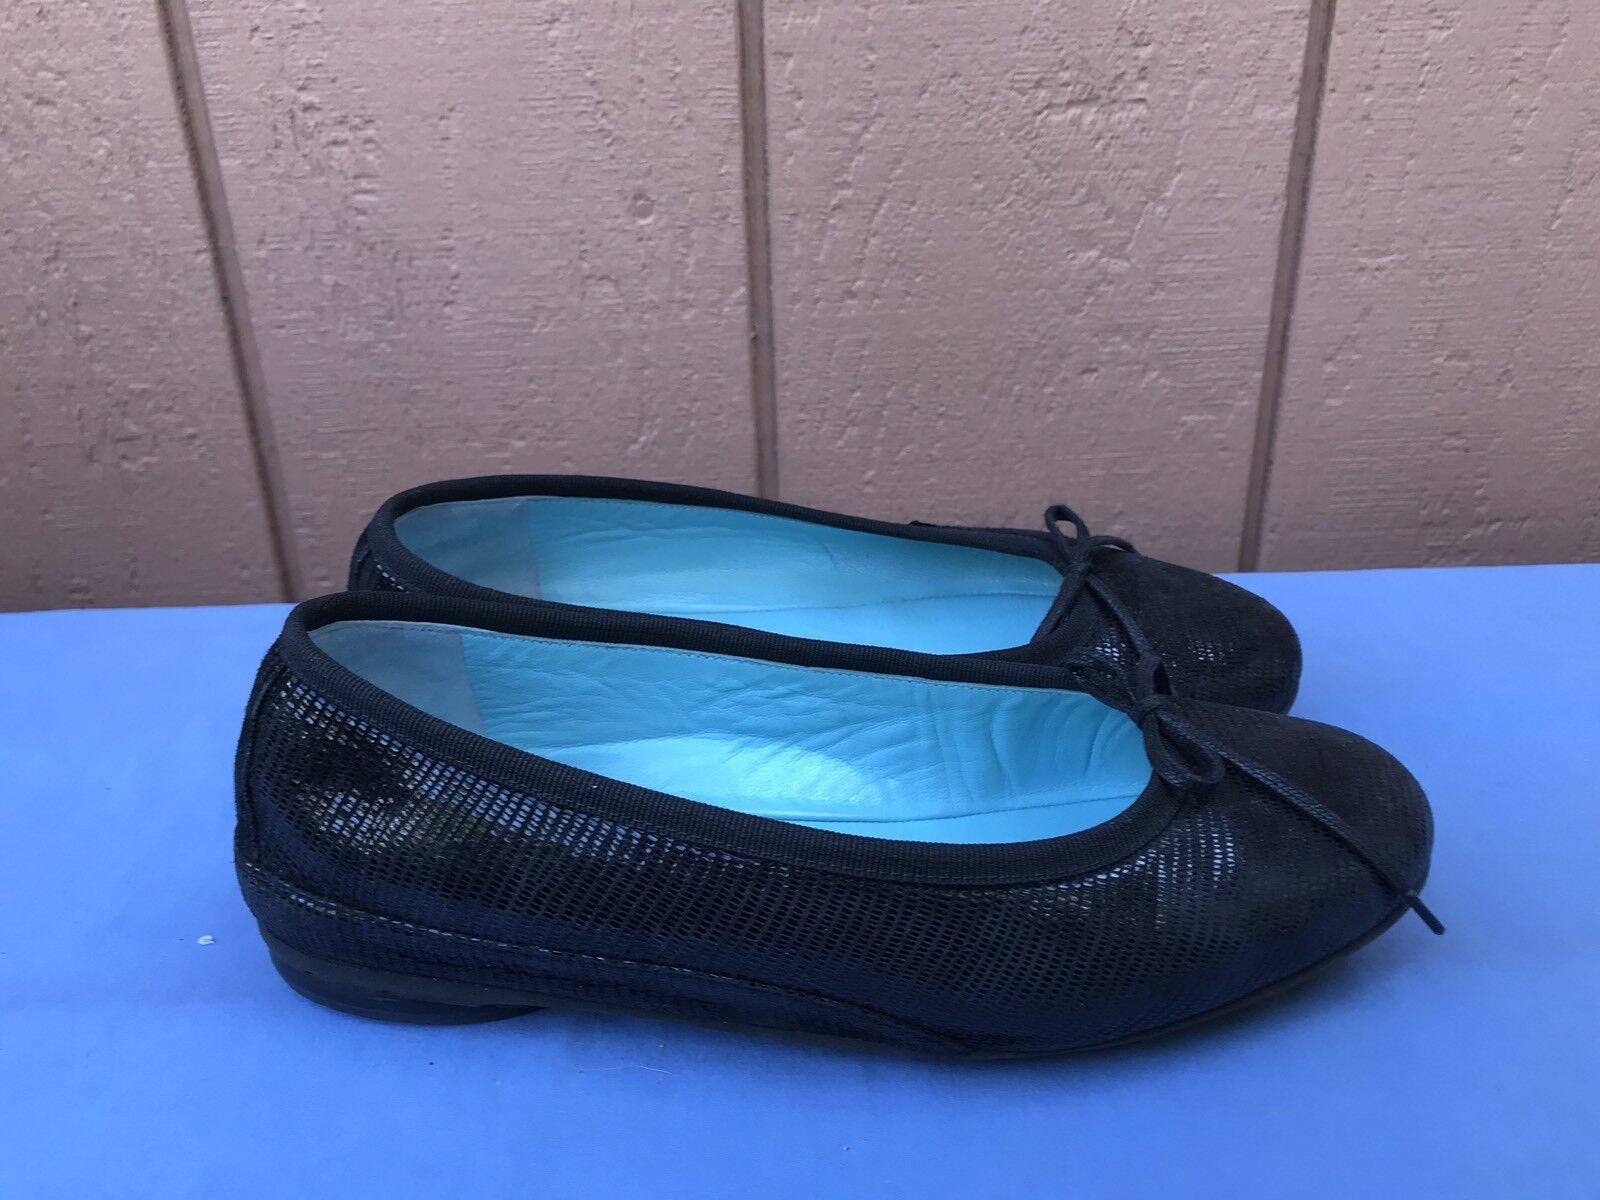 Mismatch THIERRY RABOTIN $420 L US L $420 5 / R 5.5 Gem ITALY Ballerina Black Flats A5 1ab580